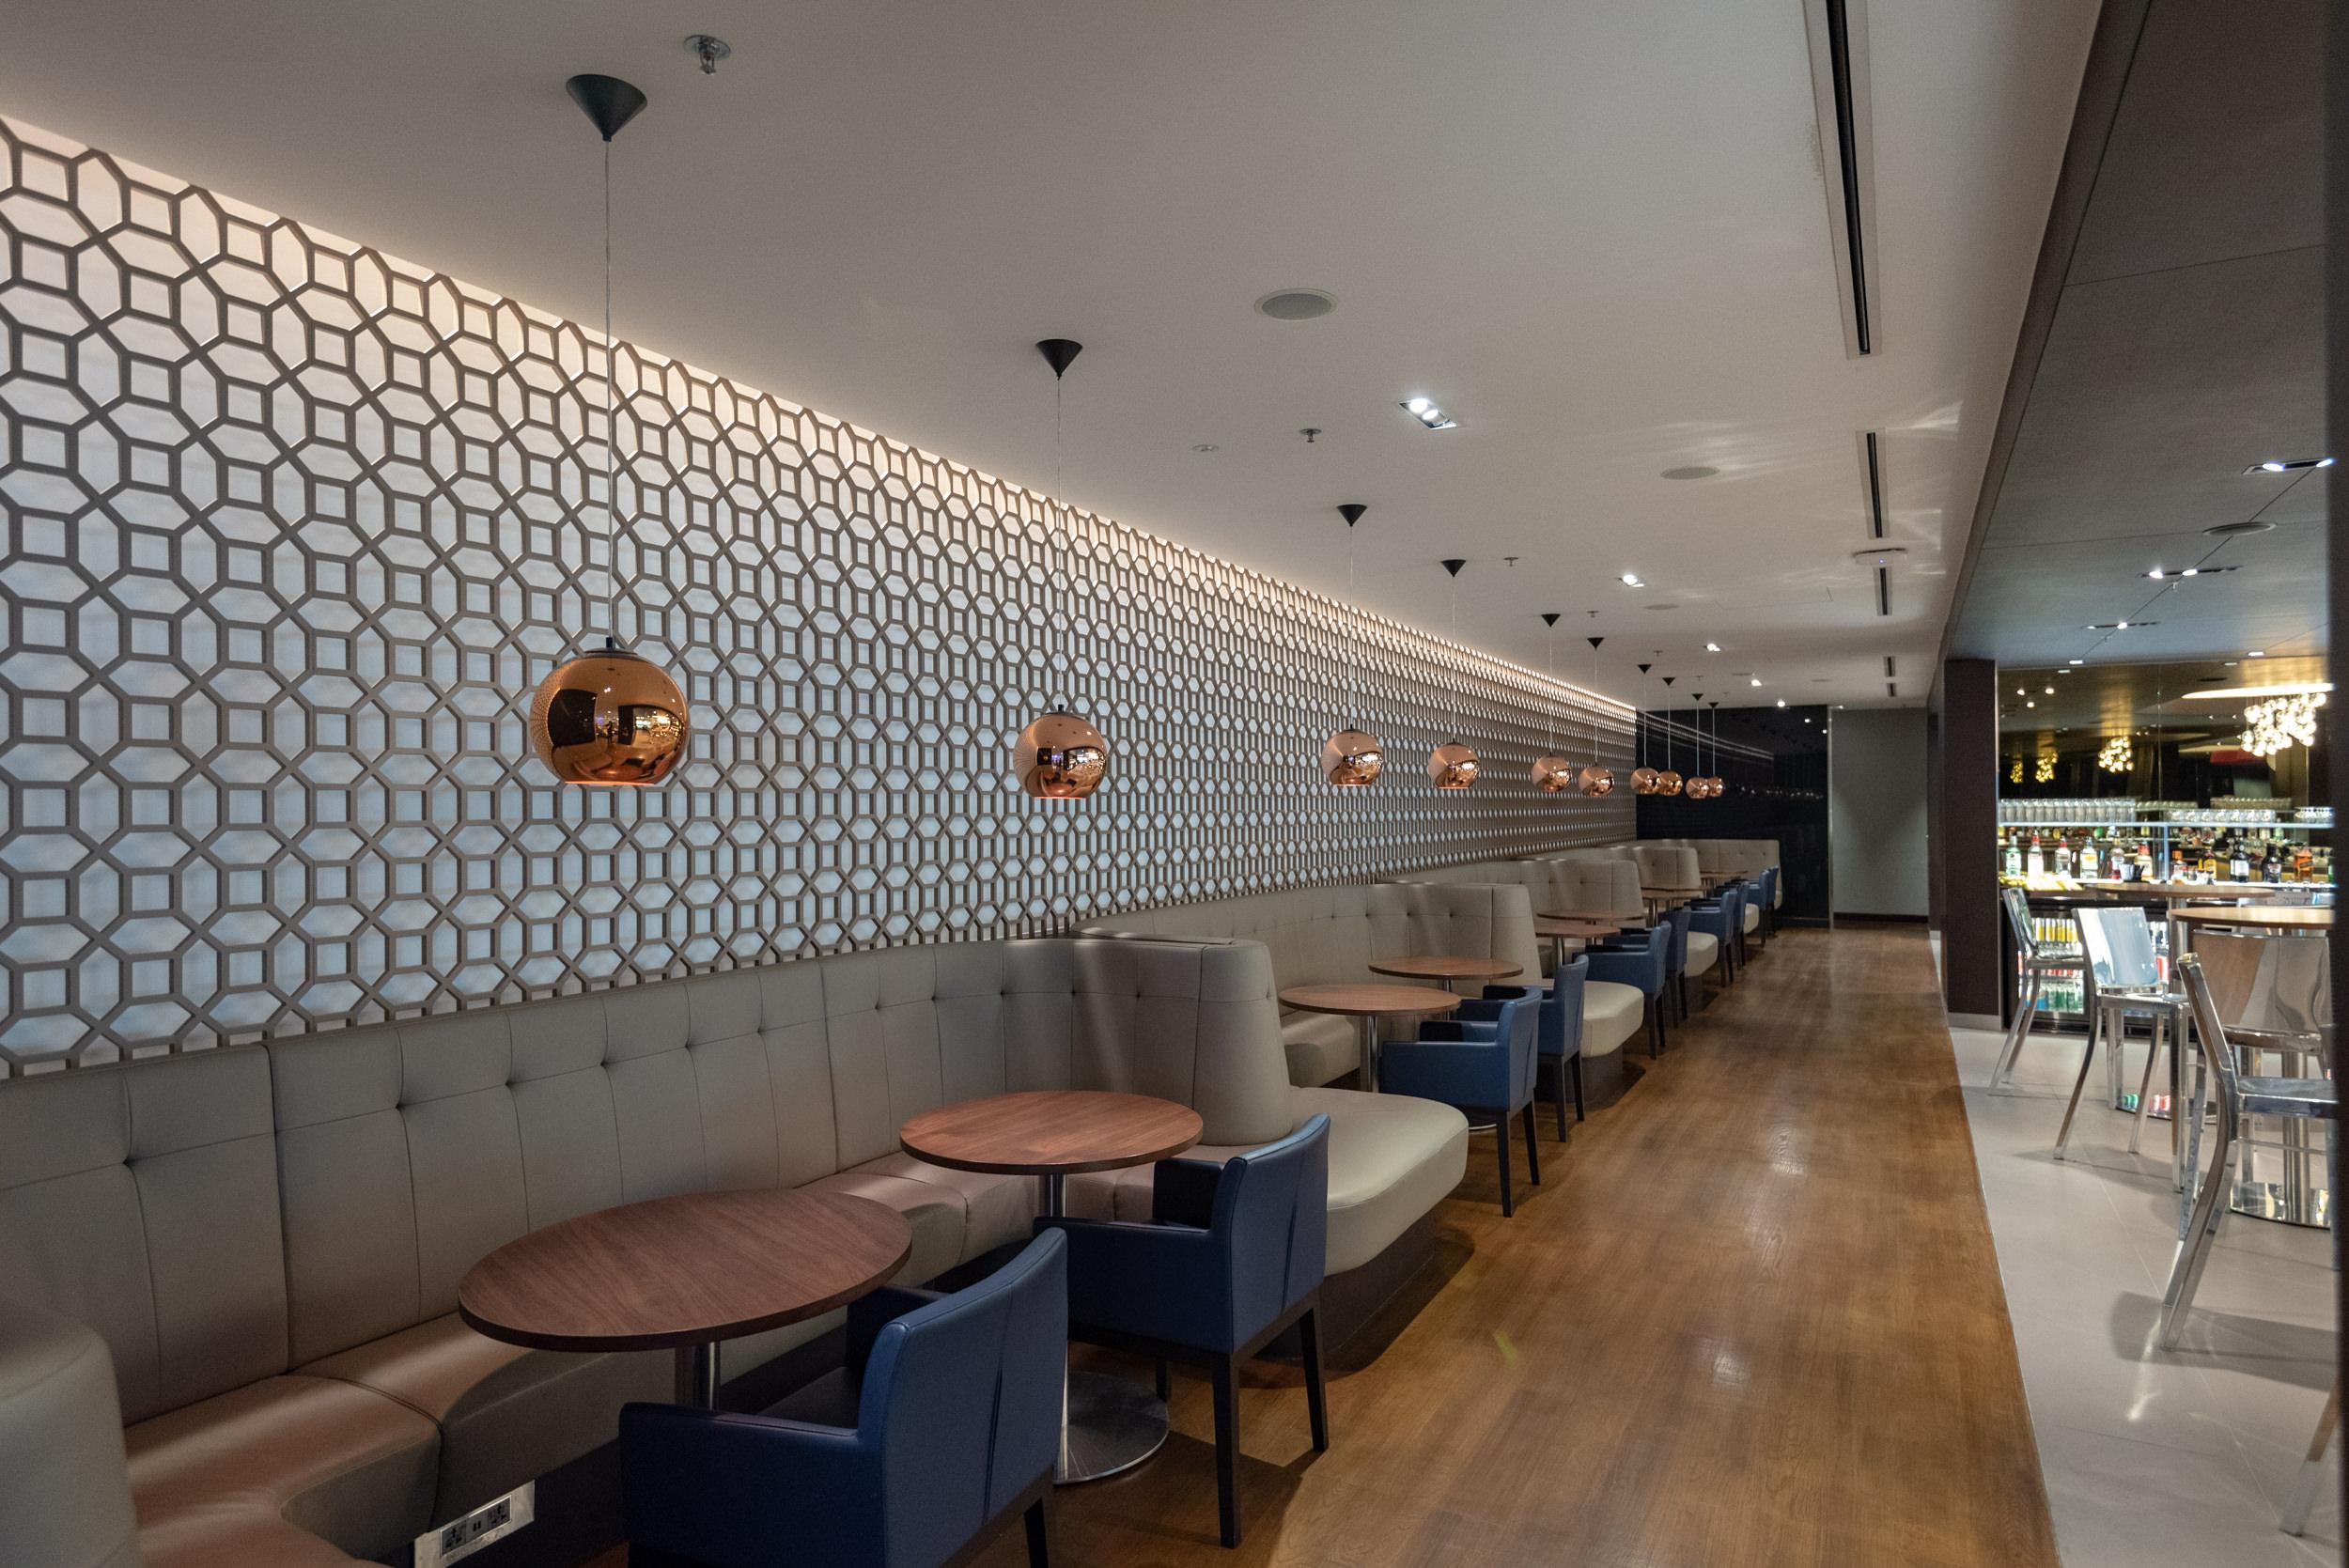 British Airways Lounge and Concorde Bar - Singapore Changi Airport (SIN)